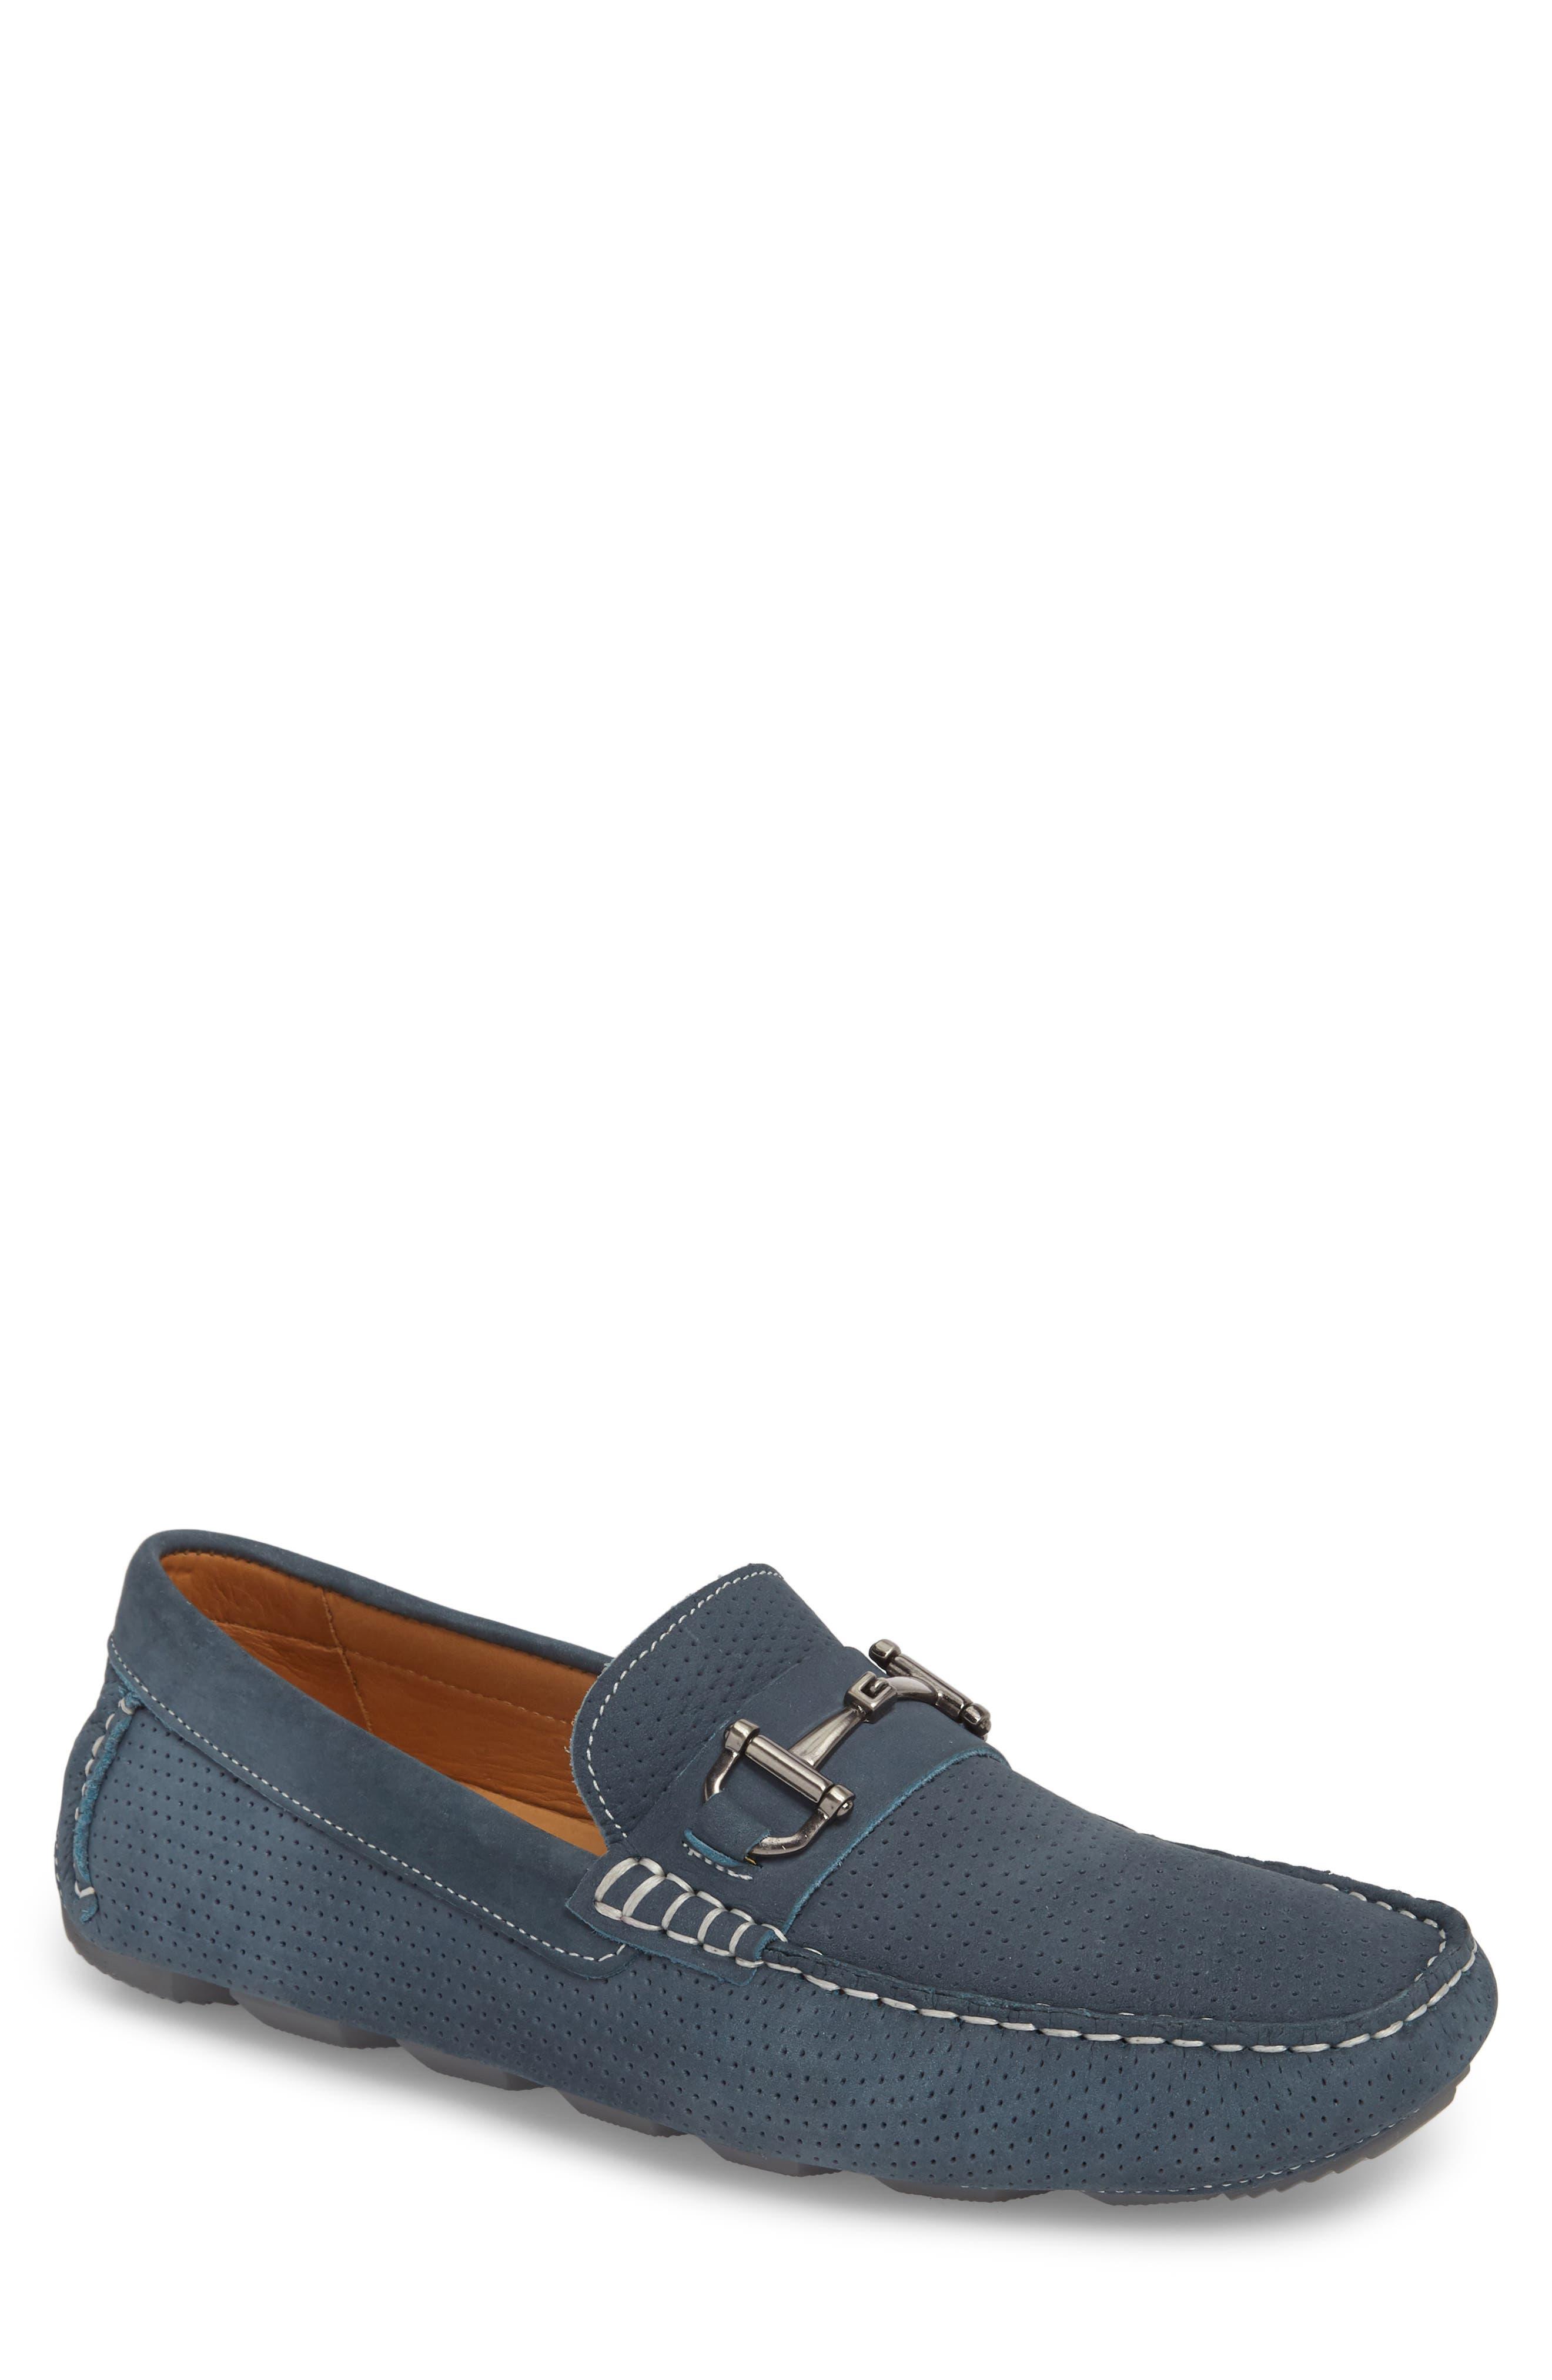 Destin Driving Shoe,                         Main,                         color, TEAL HIDRO